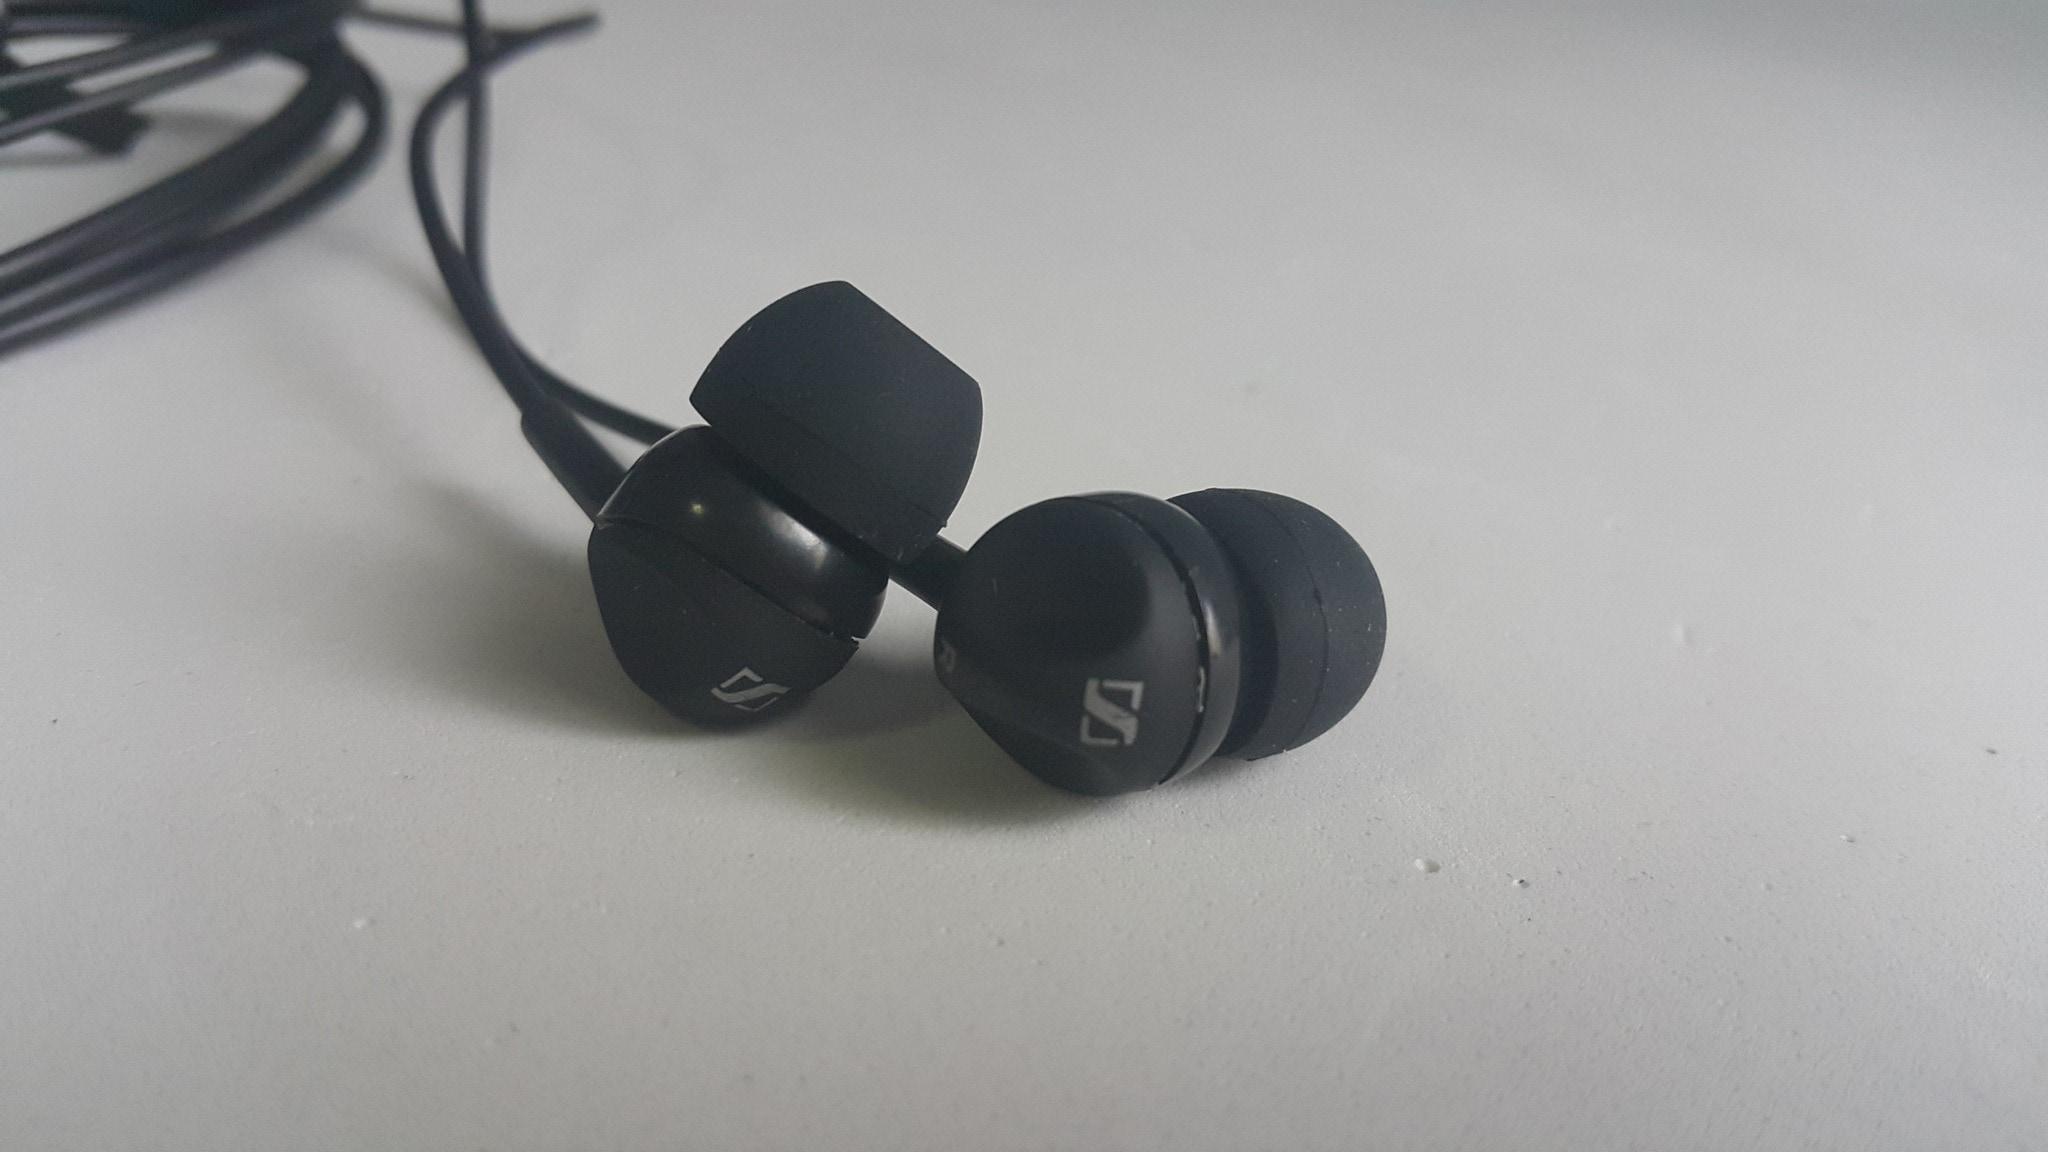 Jual Sennheiser Cx200 Ii Precision And Bass Sound Oem Cx 200 Original Earphone Headset Headphone Loosing Pack Black Mur Damar Aksesoris Tokopedia